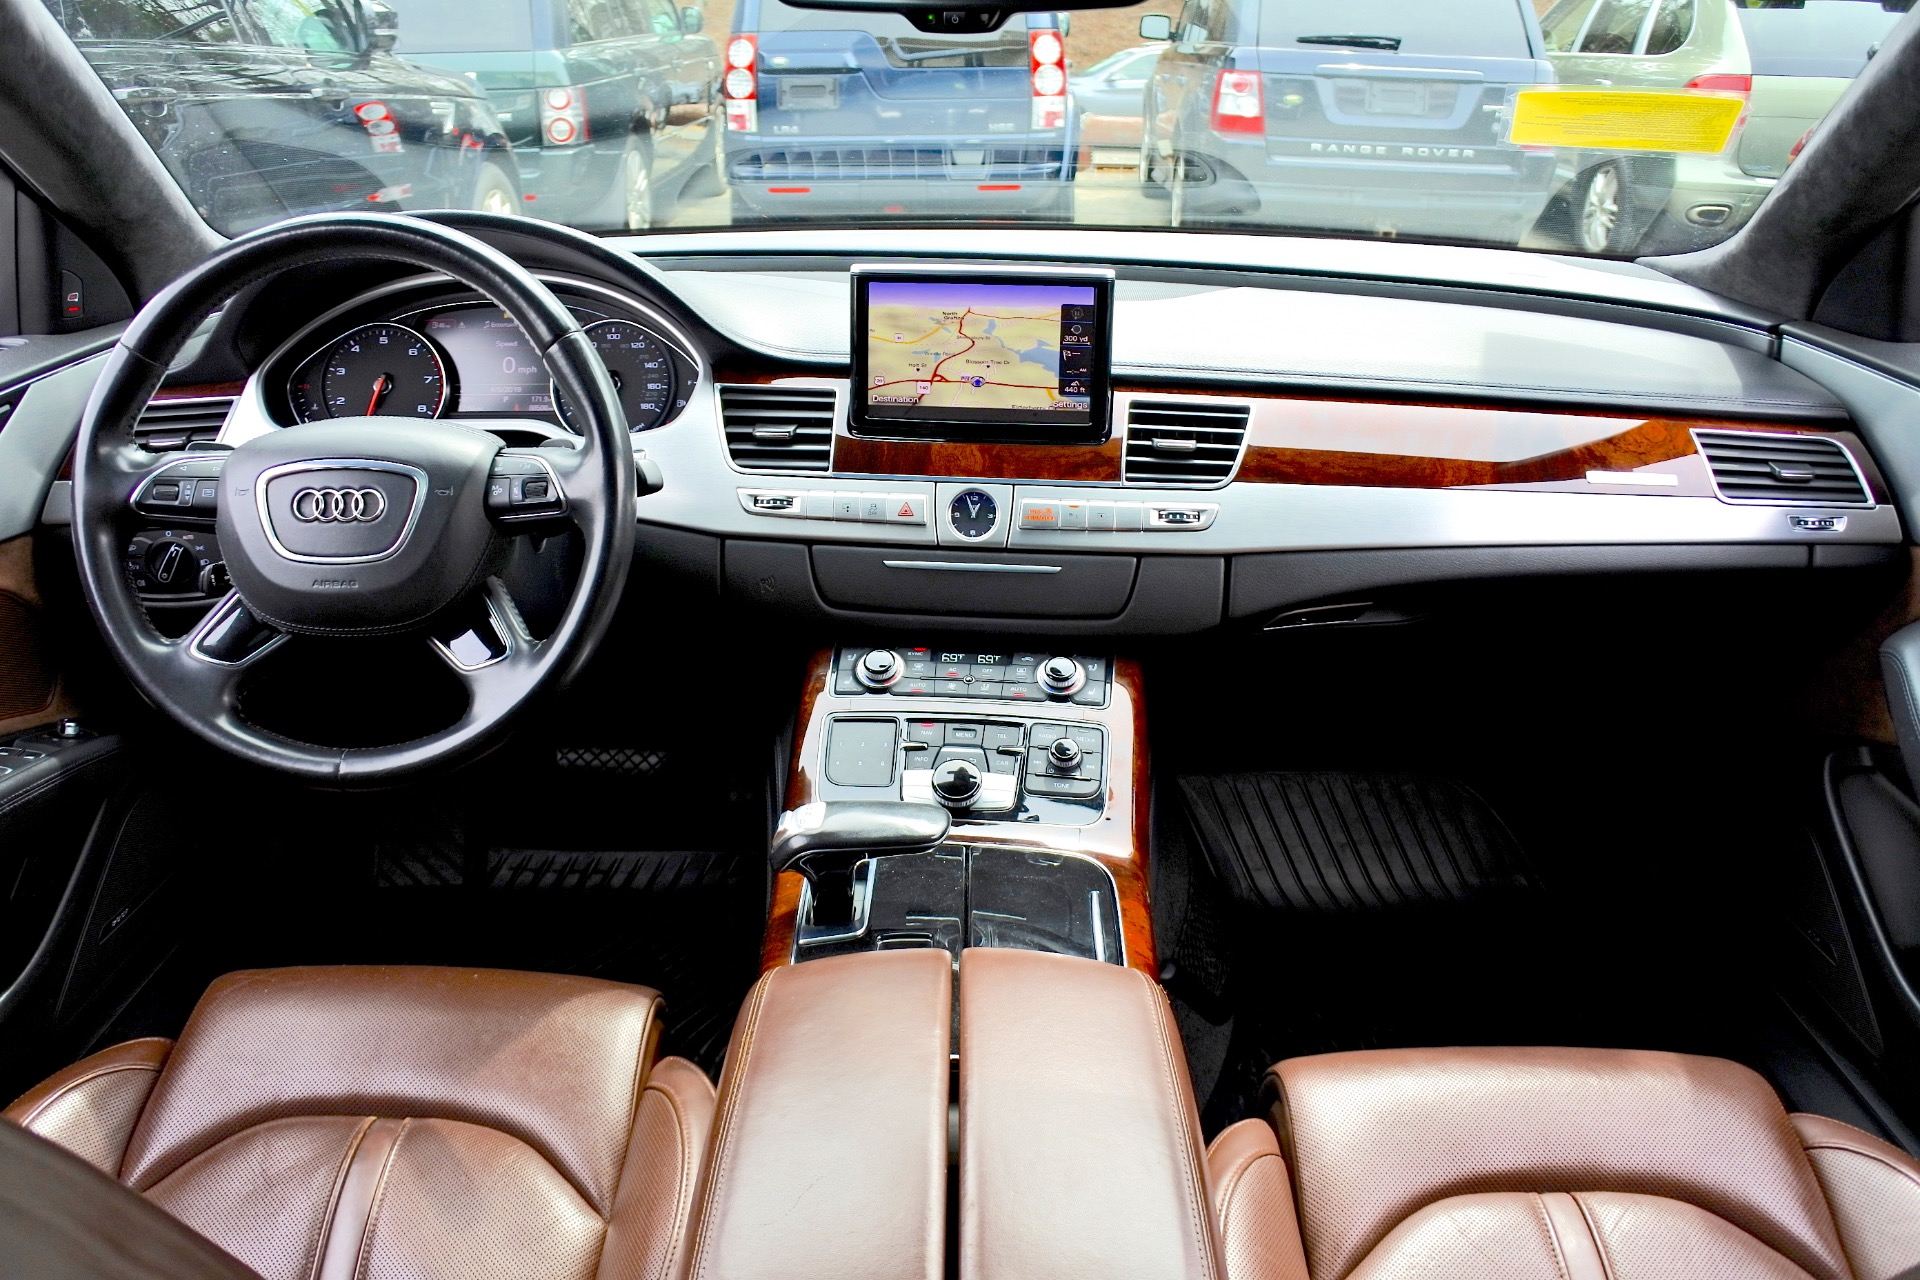 Used 2012 Audi A8 l W12 Quattro Used 2012 Audi A8 l W12 Quattro for sale  at Metro West Motorcars LLC in Shrewsbury MA 9